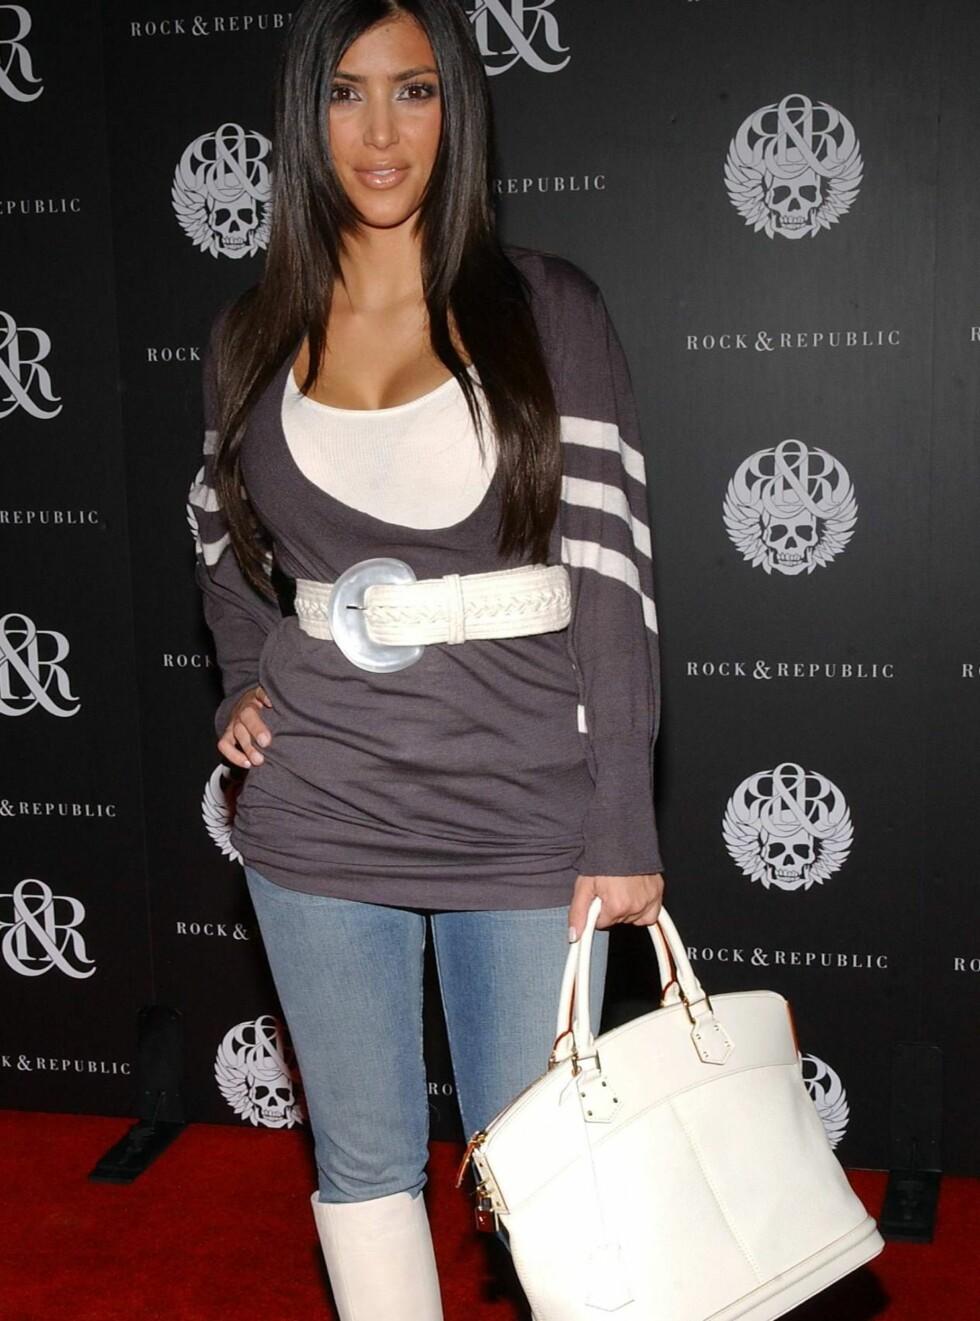 ELSKER SHOPPING: Paris Hiltons gode venninne og stjernestylist Kim Kardashian, var en de mest elegante på den røde løperen. Foto: Stella Pictures